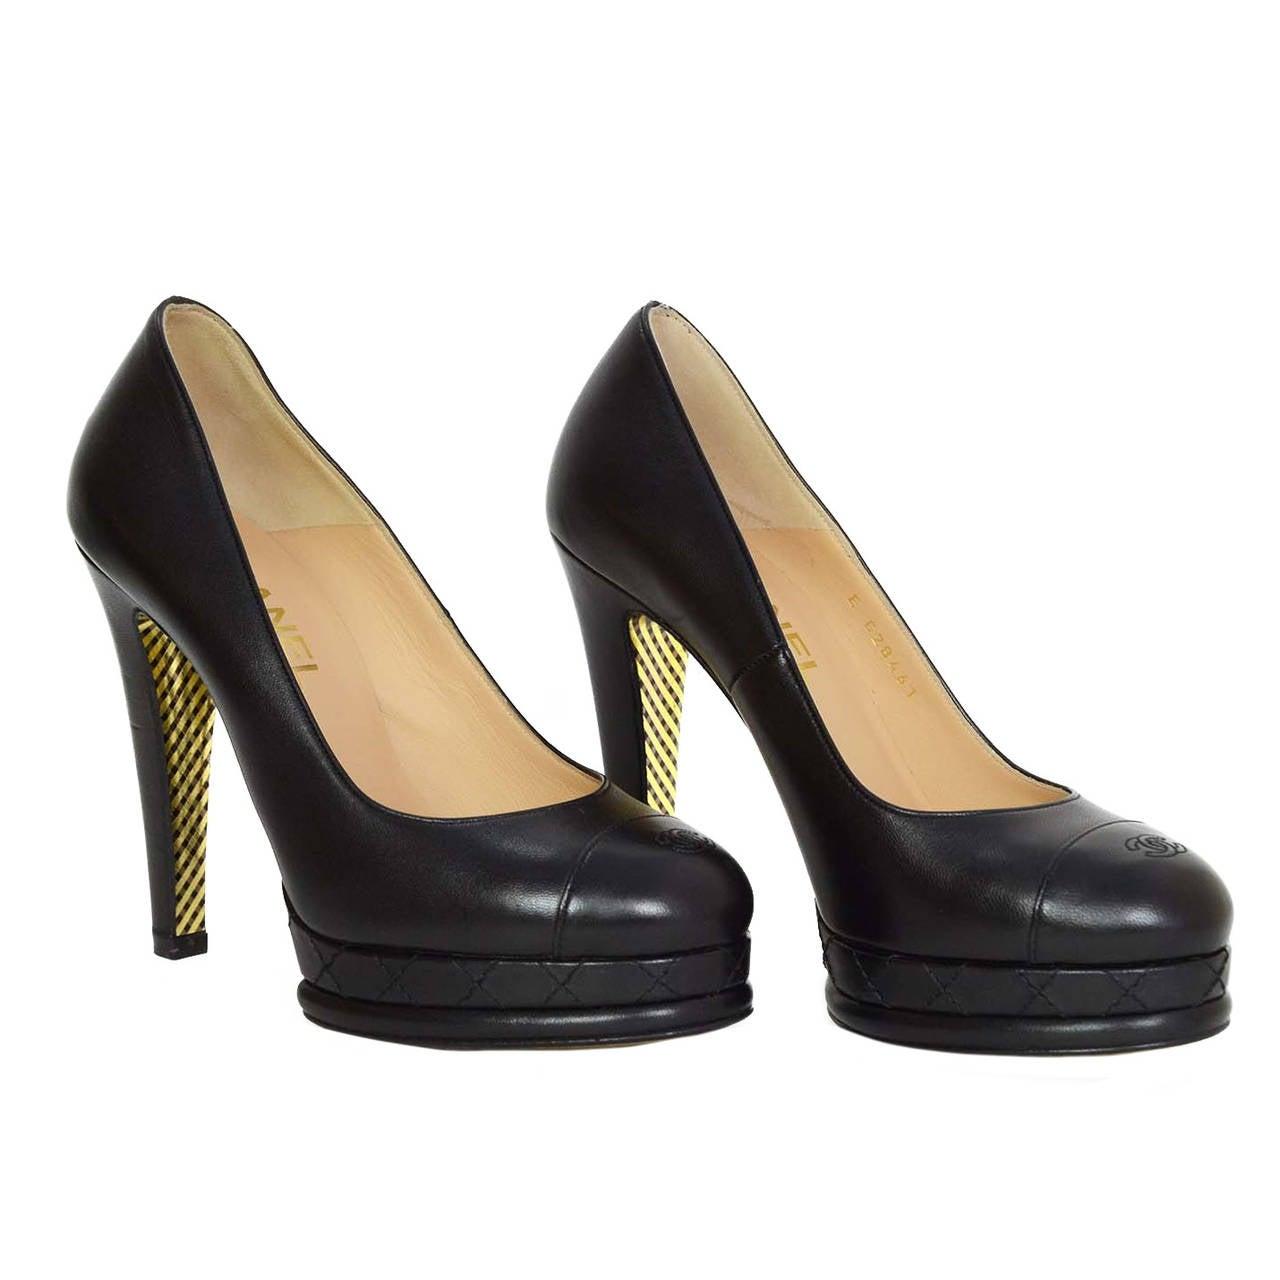 CHANEL Black Leather Round Toe Pumps sz 37 1